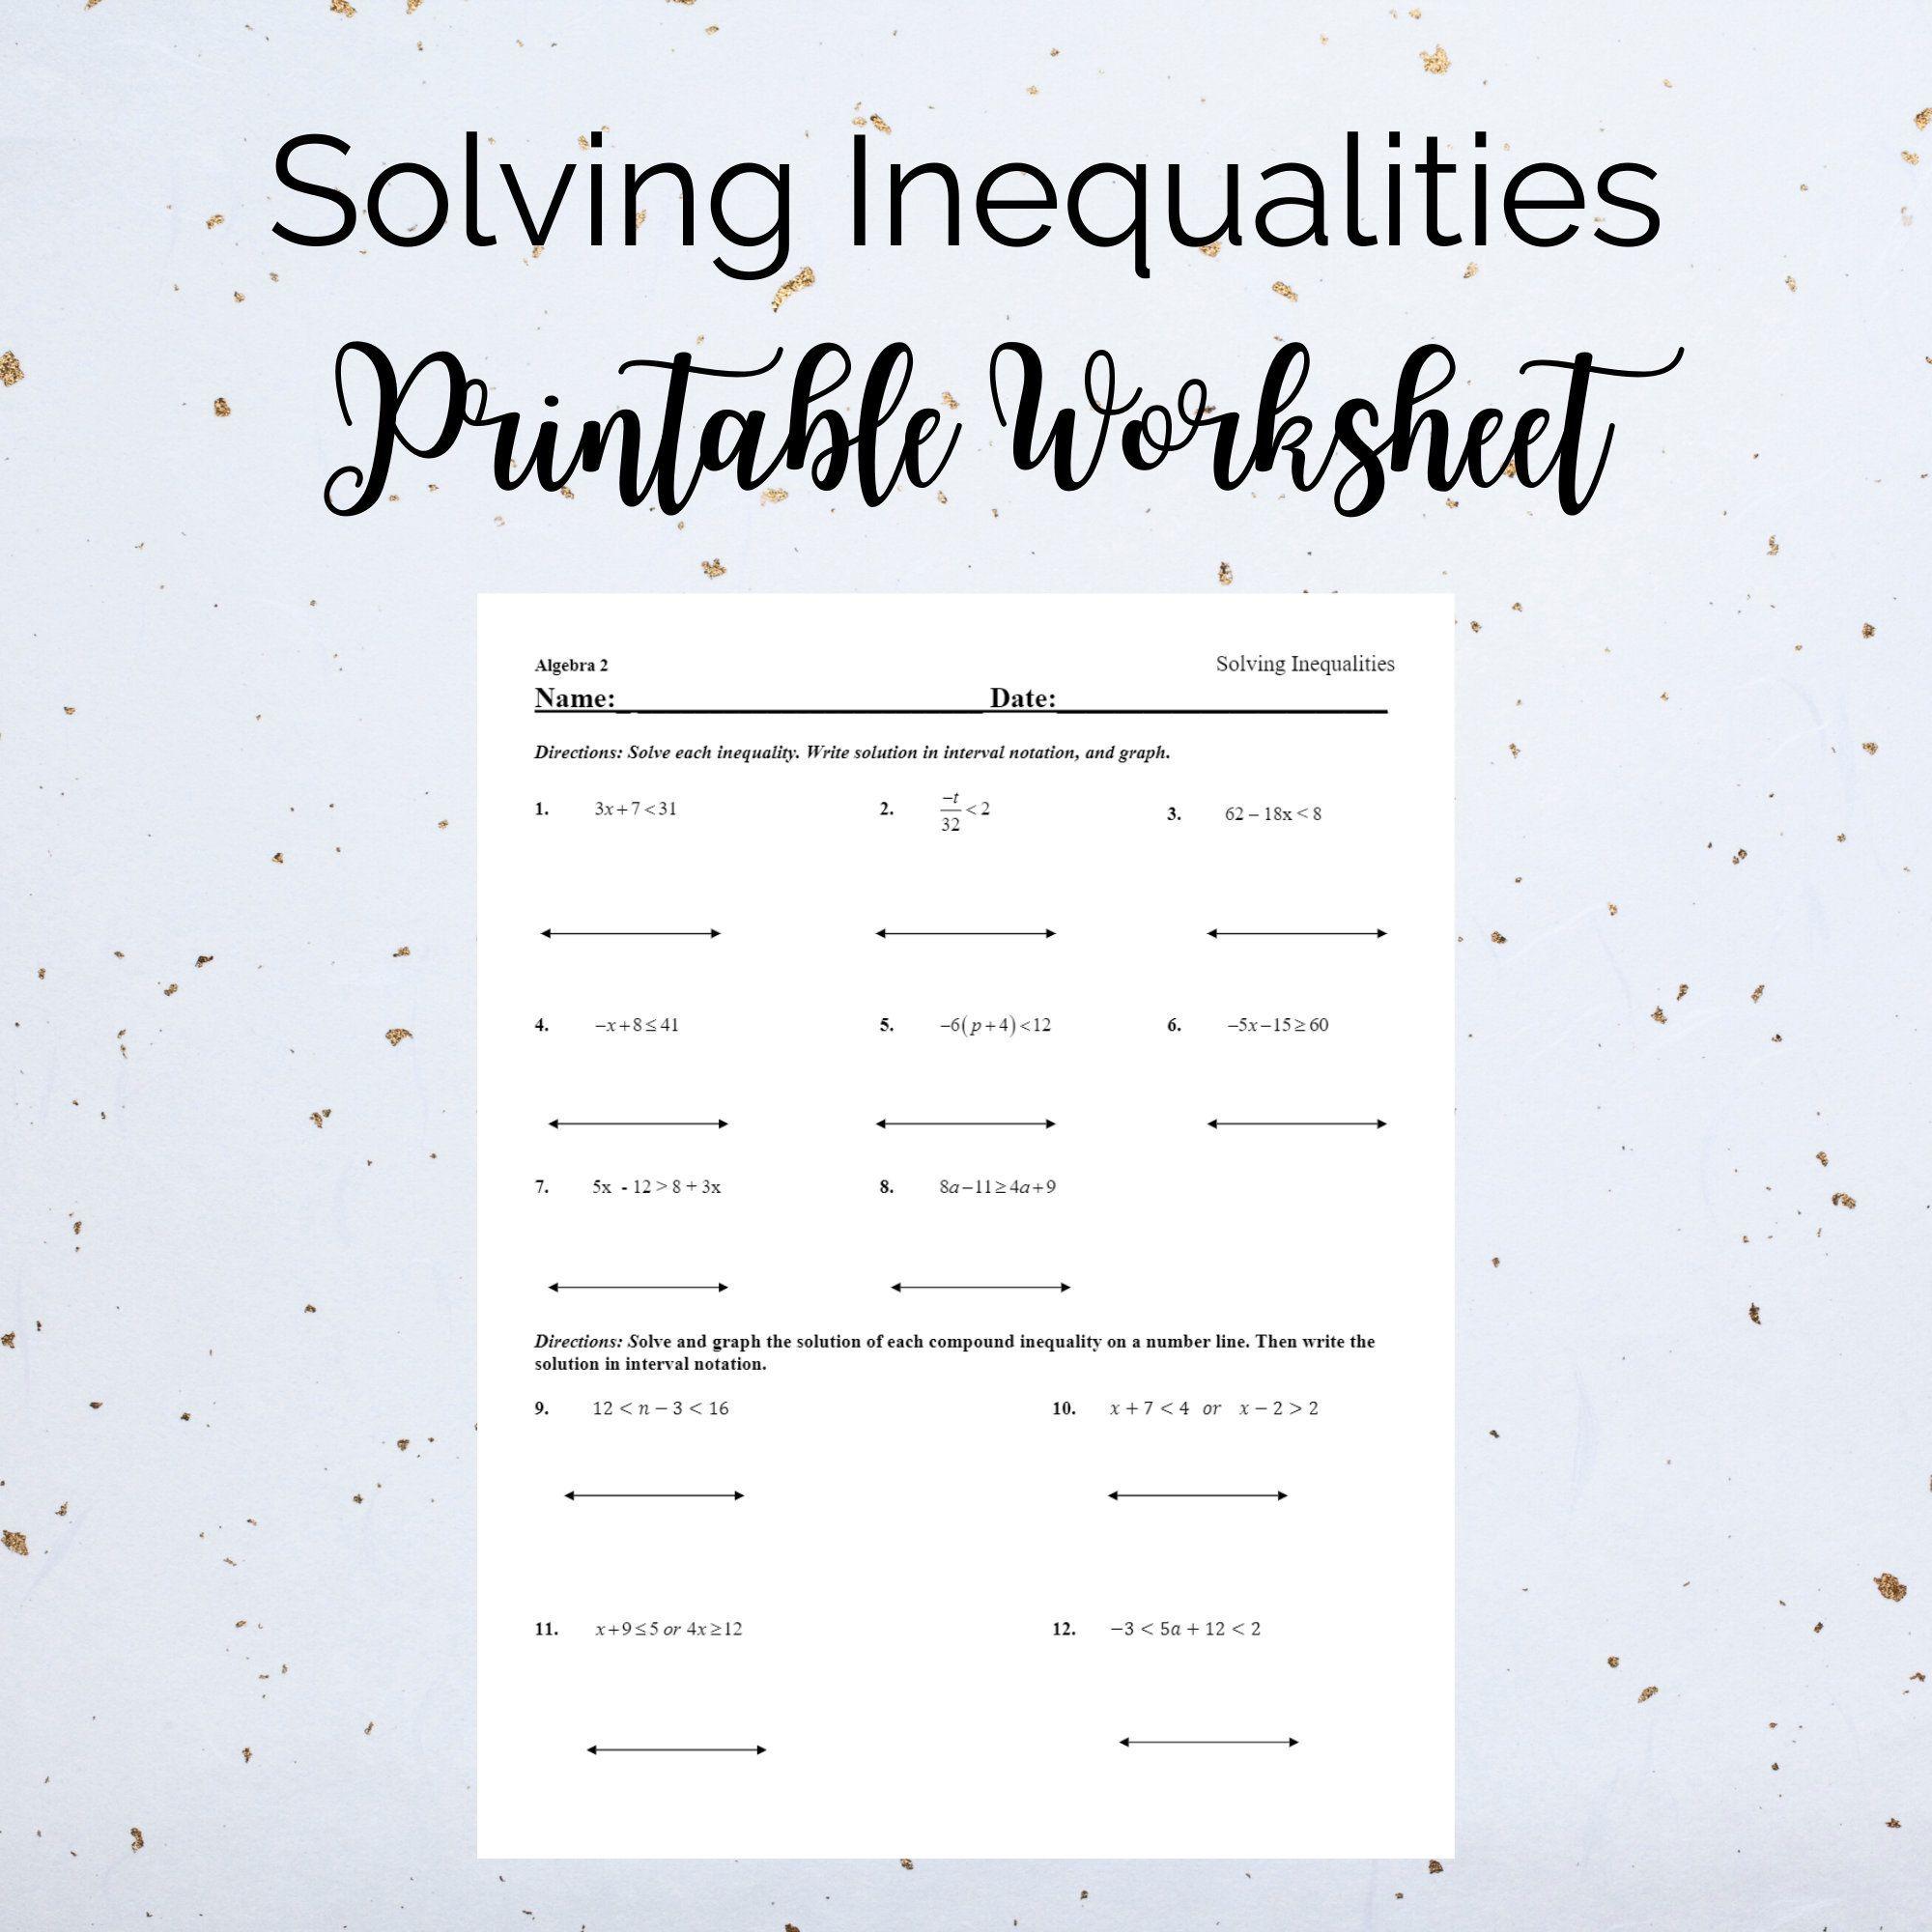 Solving Inequalities Printable Exercise Worksheet Grade 7 Etsy In 2021 Solving Inequalities Graphing Linear Equations Homeschool Worksheets